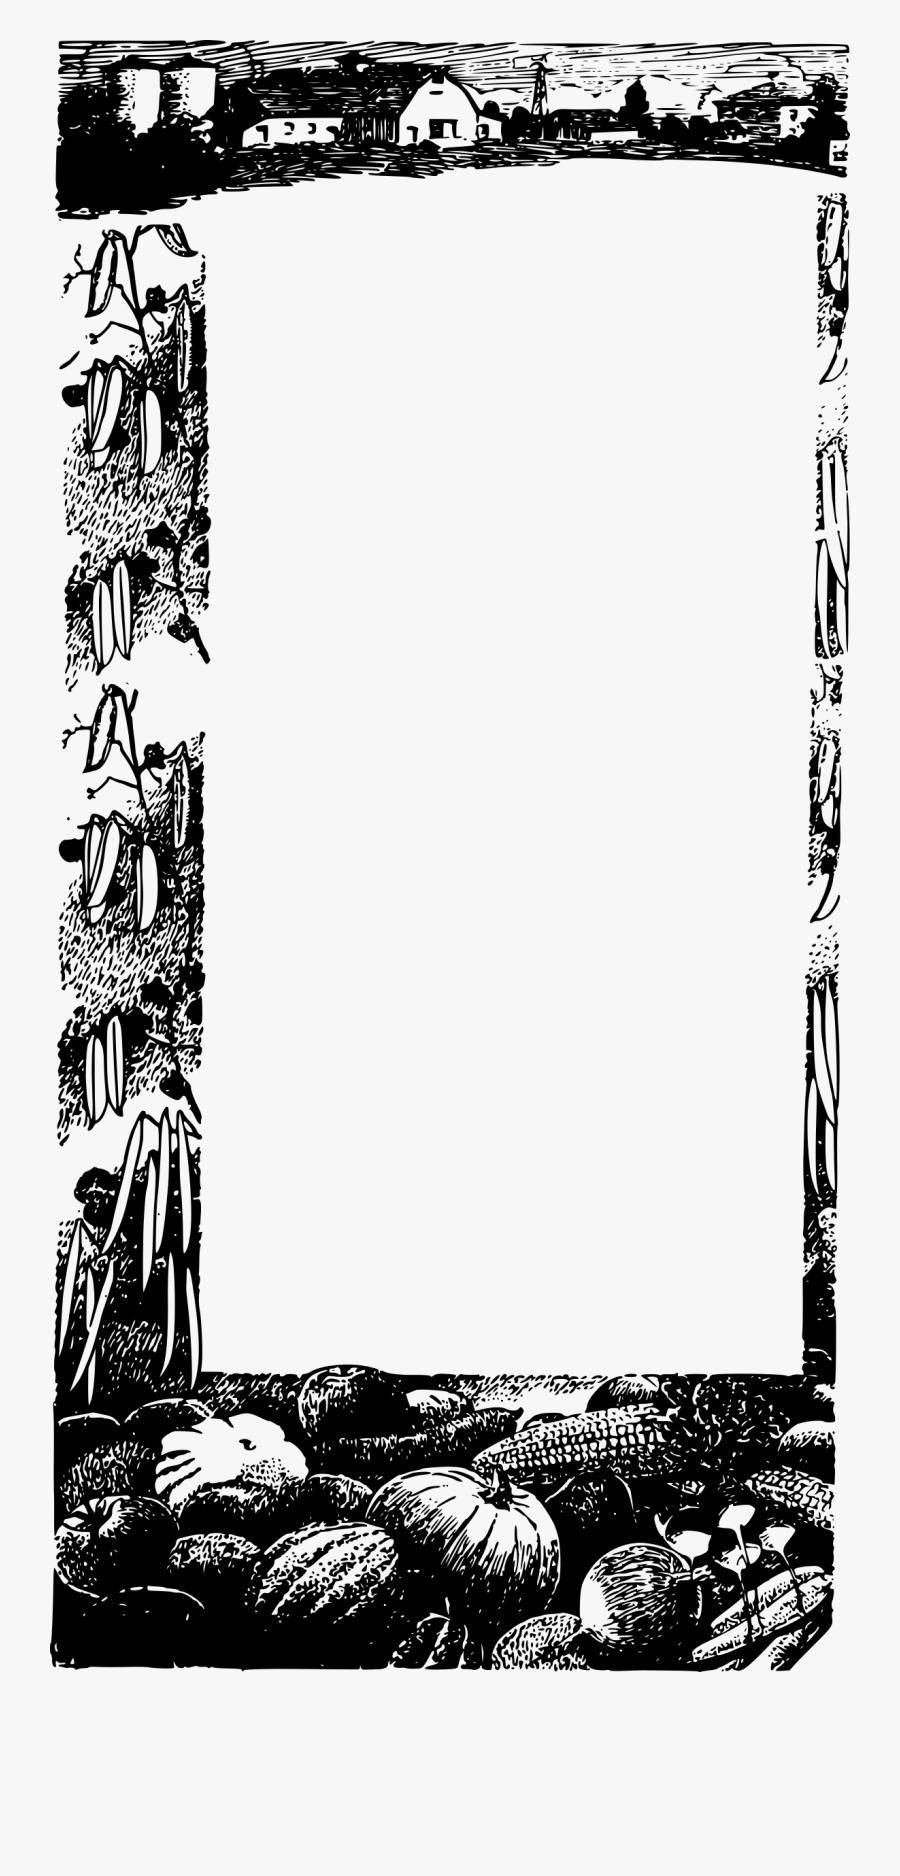 Veggies Frame Big Image - Portable Network Graphics, Transparent Clipart